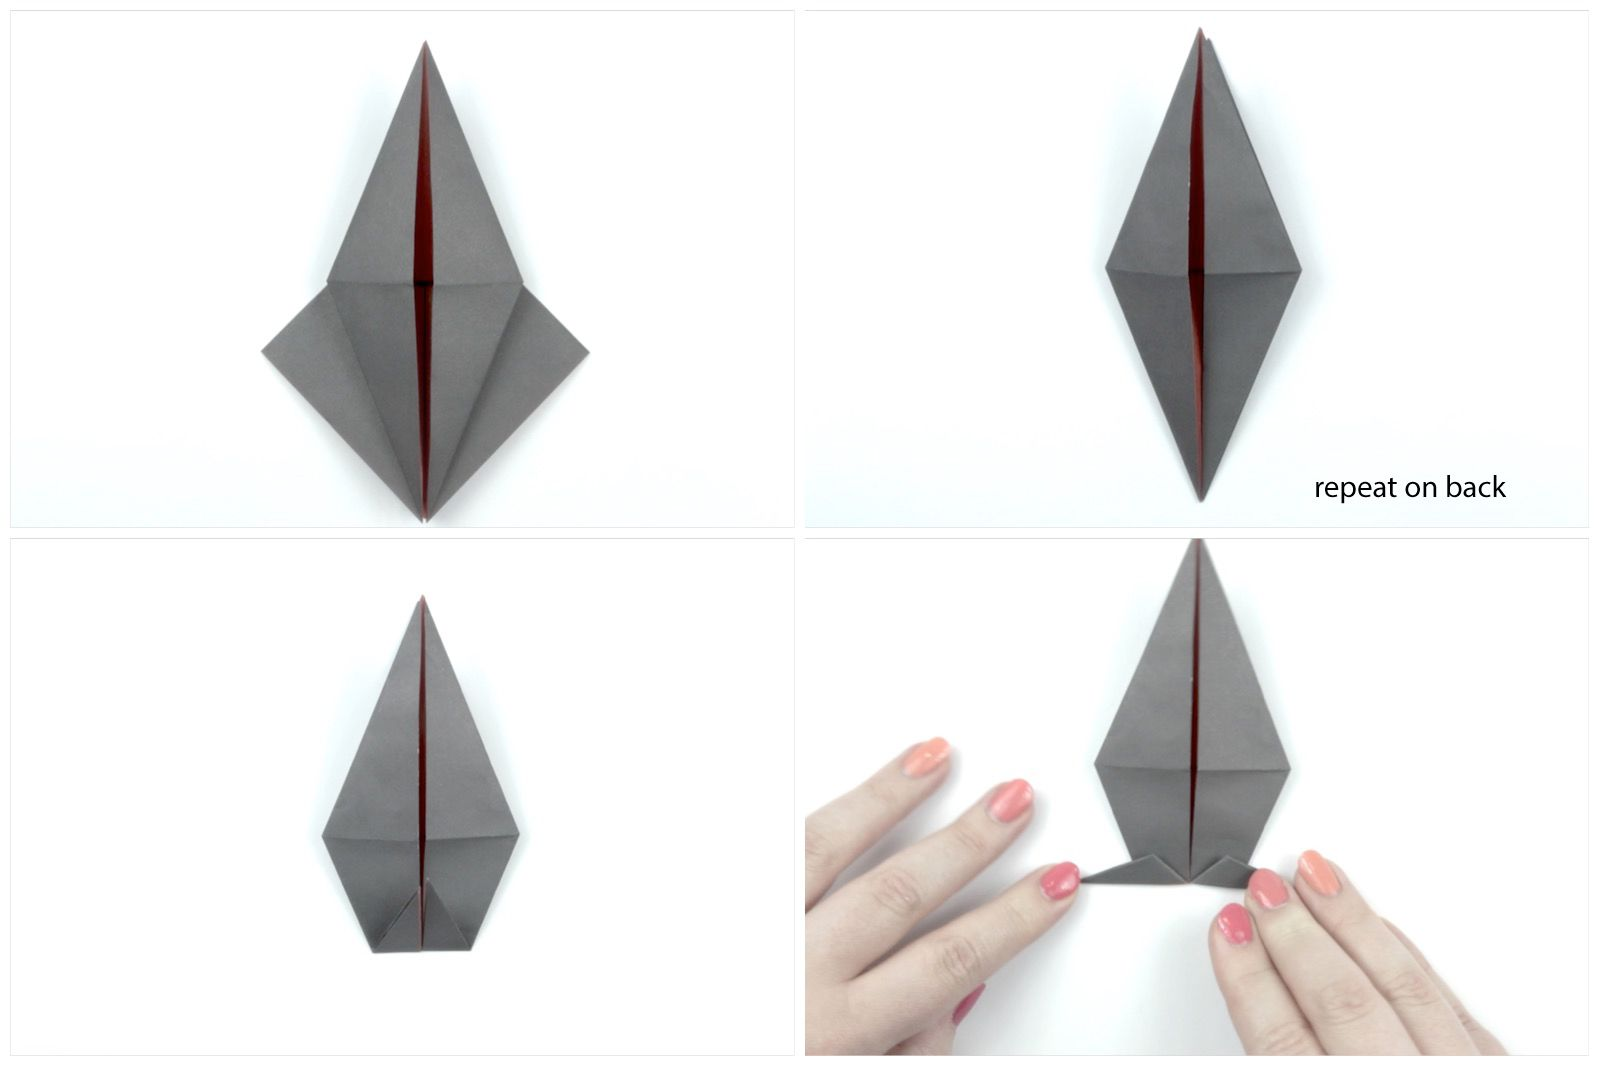 Fold the origami bird legs